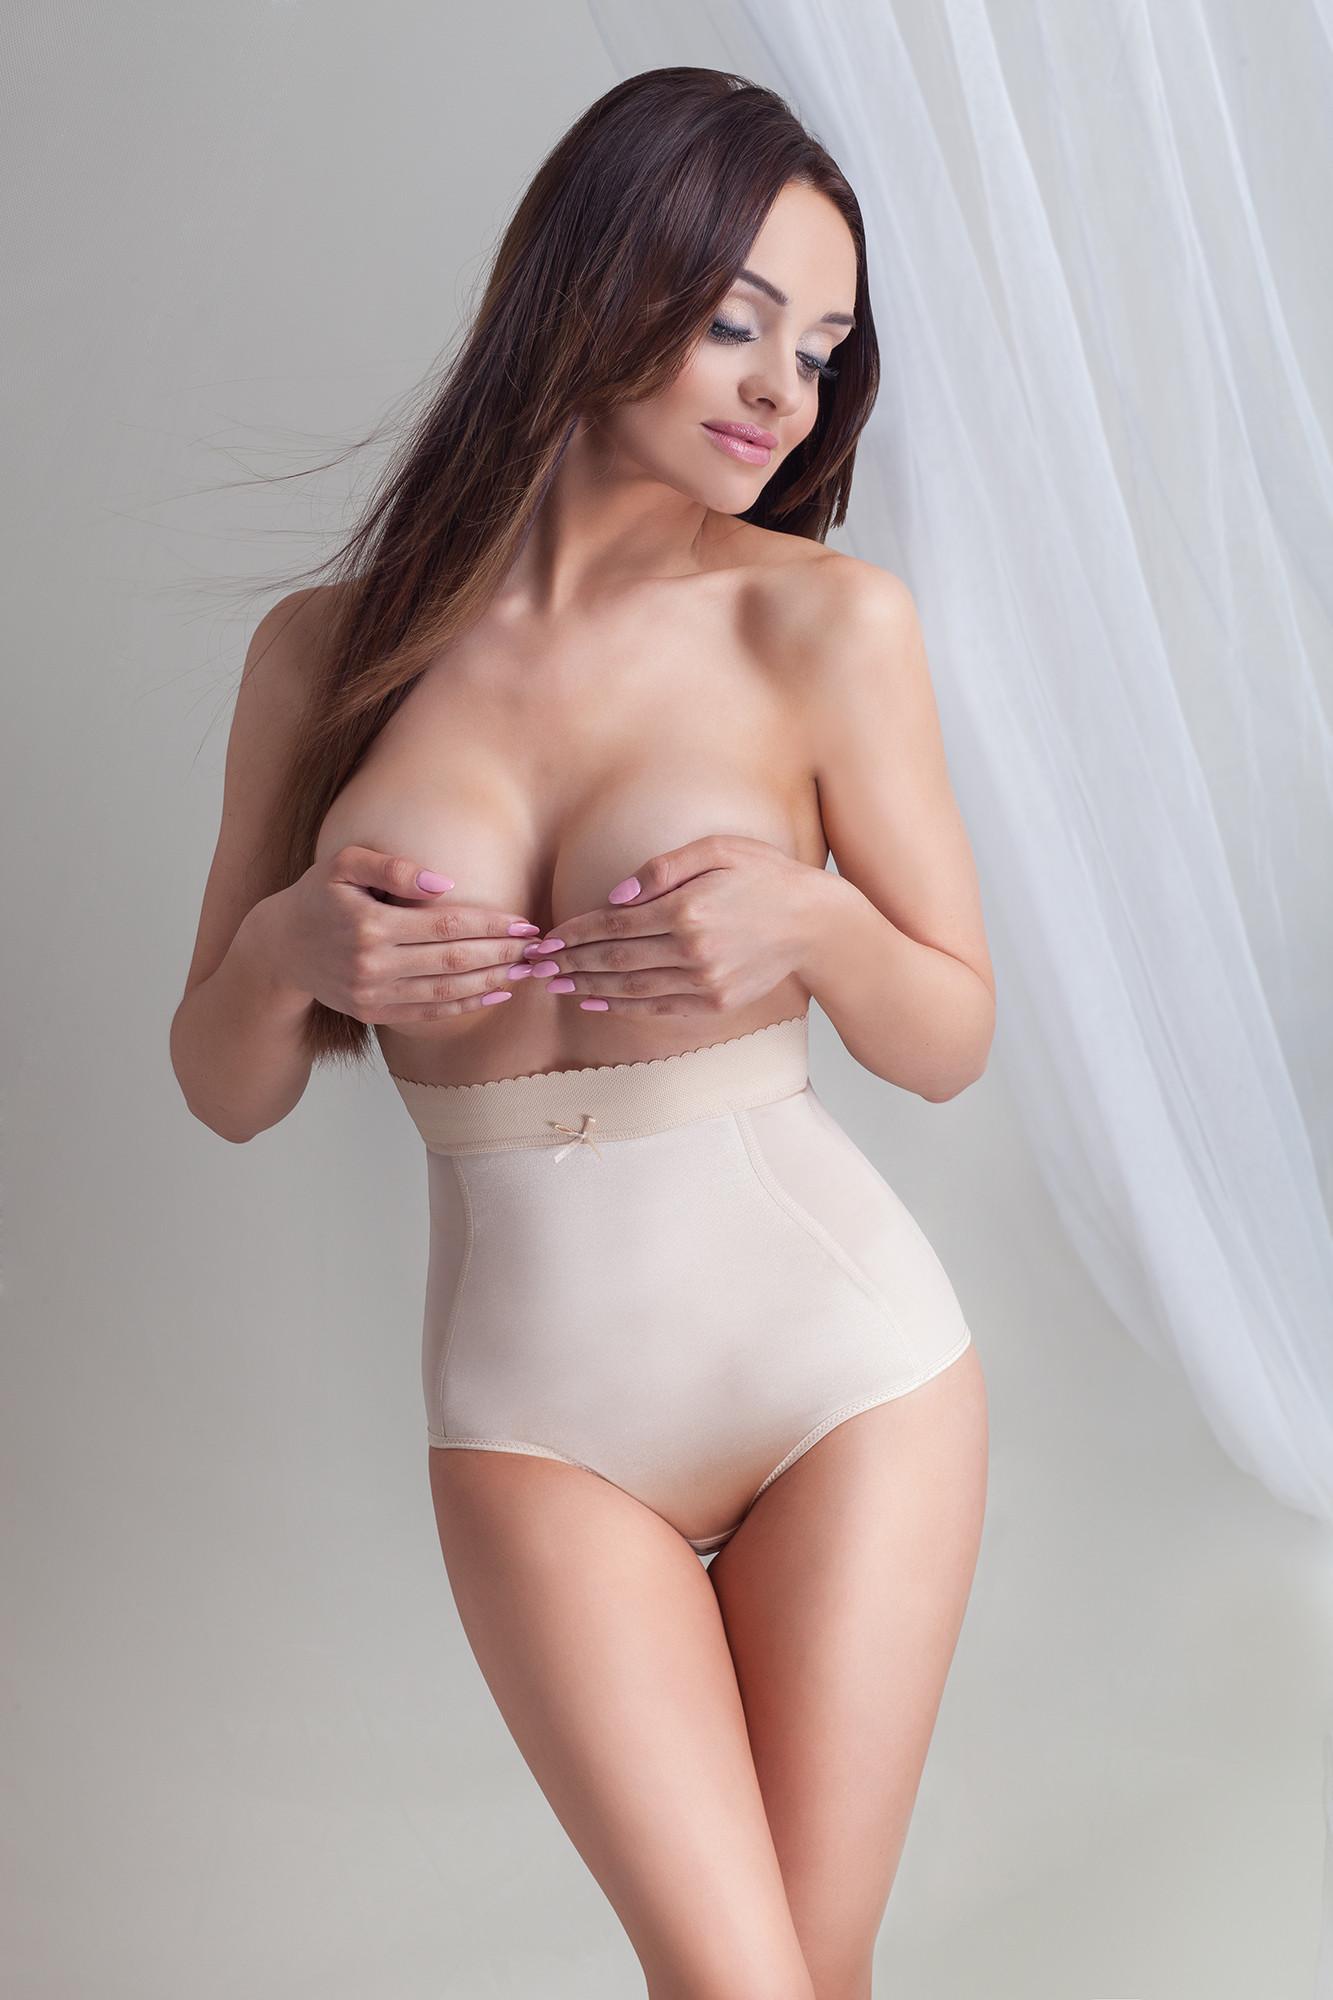 Stahovací kalhotky Day&Night Satin - Mitex Barva: bílá, Velikost: XL